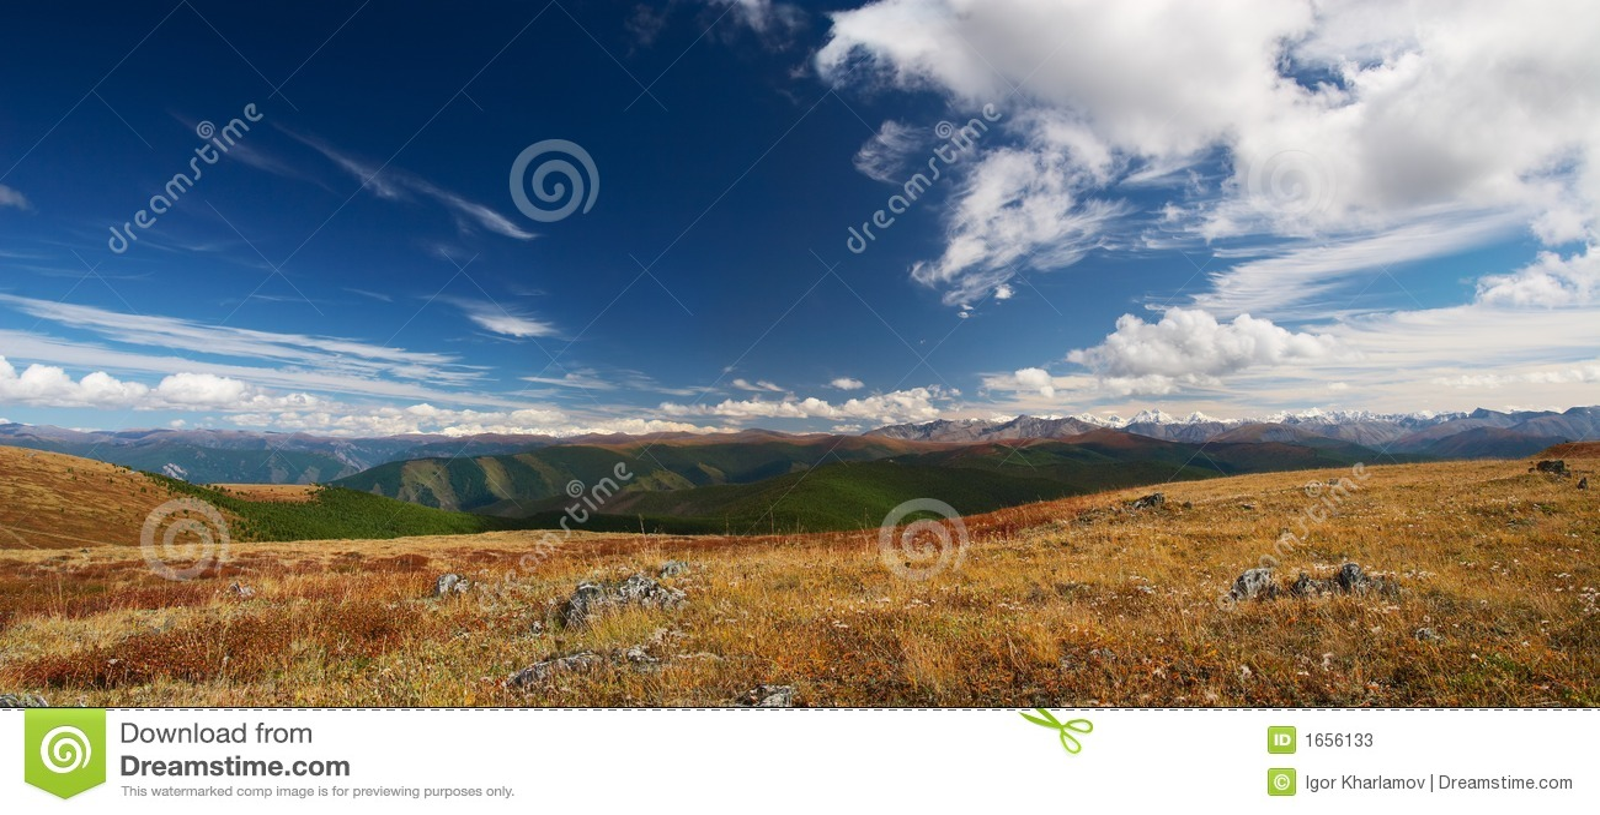 mountains sky light clouds - photo #38